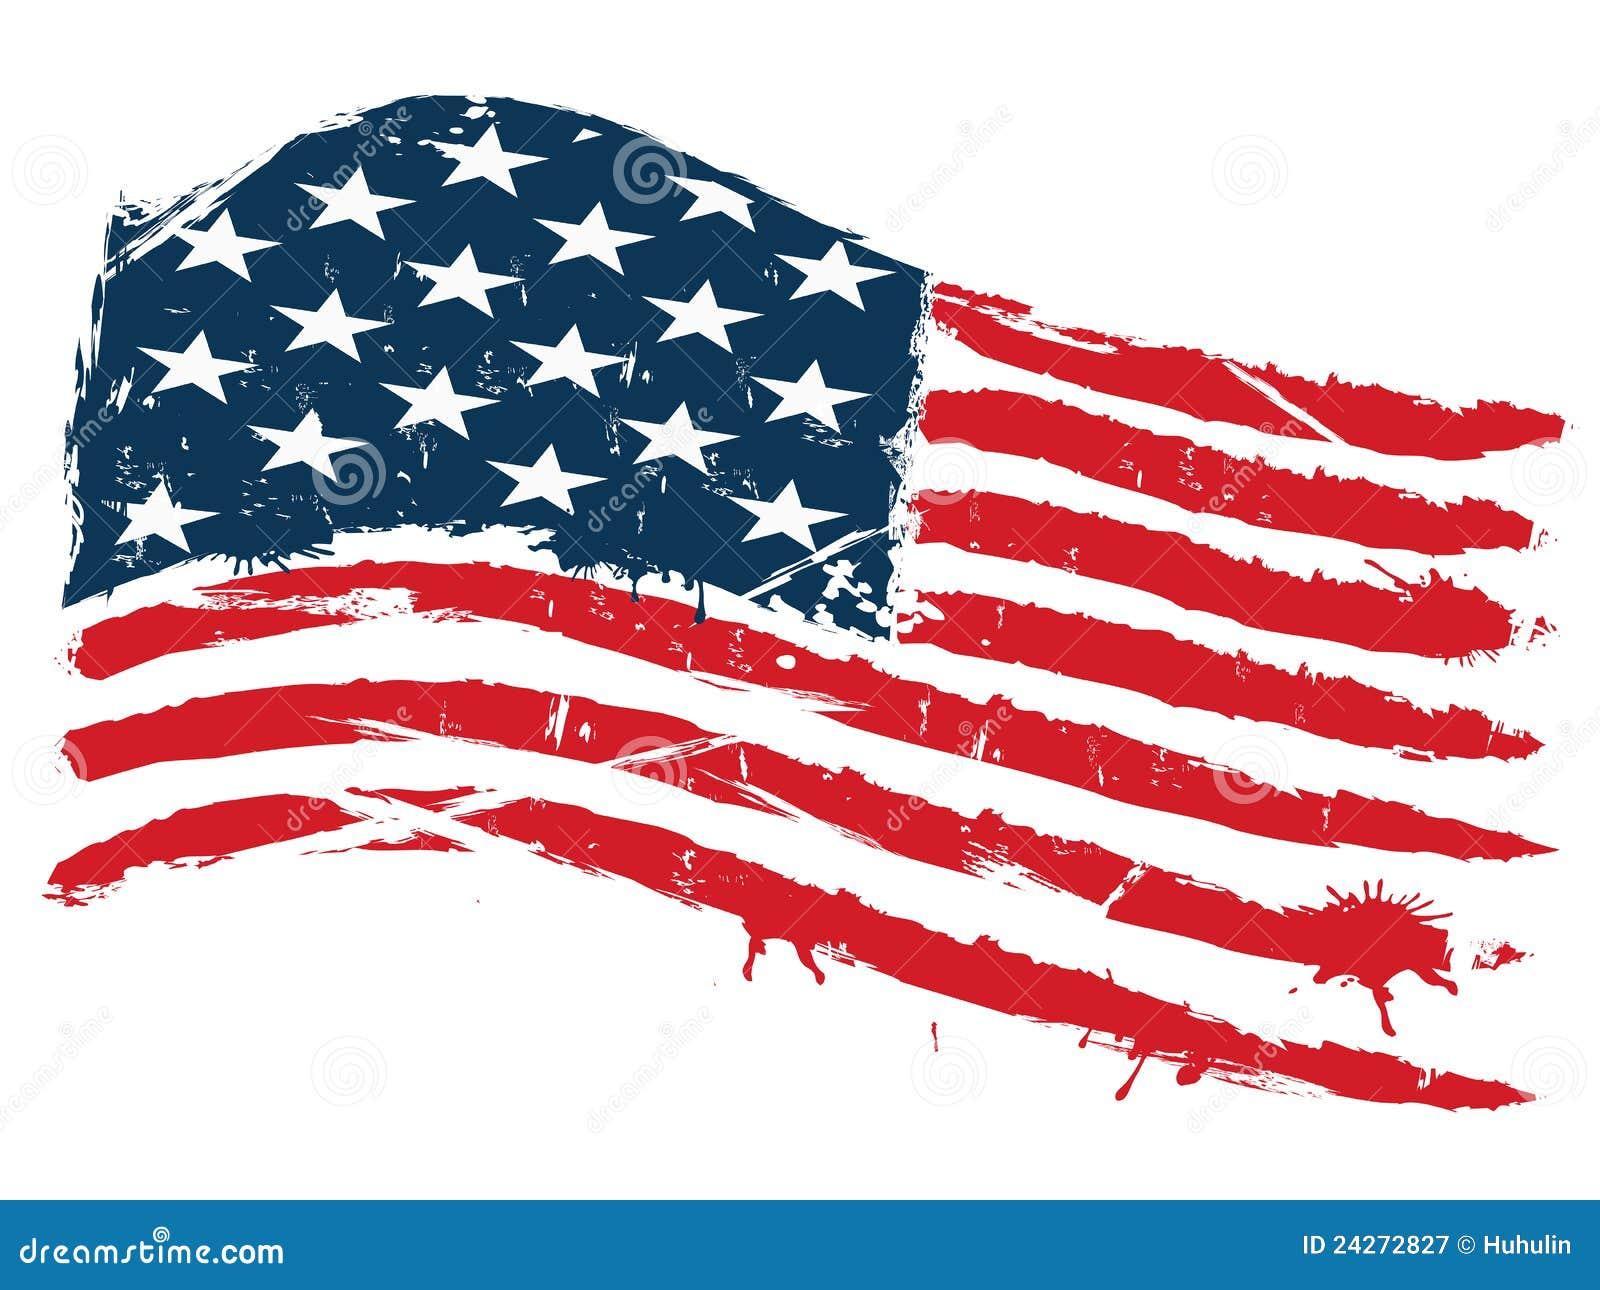 Grunge usa flag stock vector illustration of freedom 24272827 grunge usa flag publicscrutiny Gallery